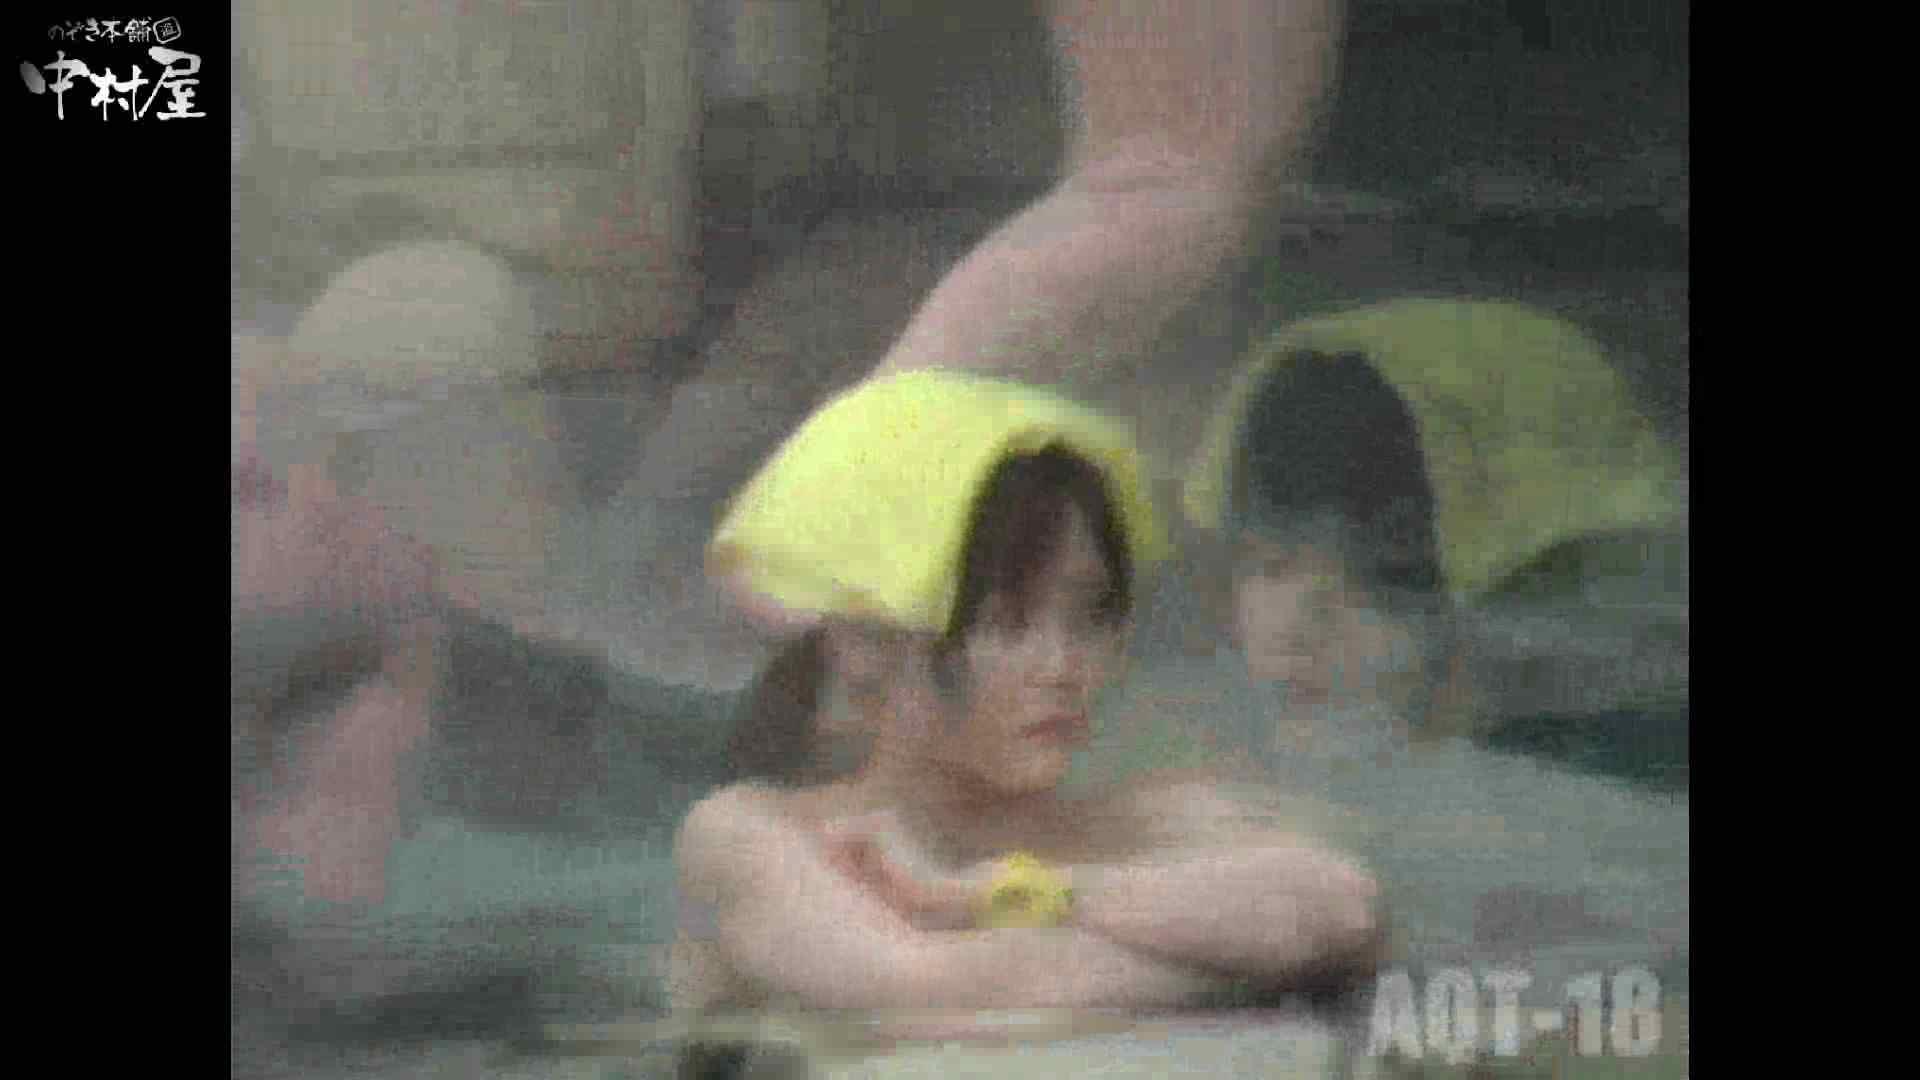 Aquaな露天風呂Vol.882潜入盗撮露天風呂十八判湯 其の一 OLセックス   露天  76画像 61